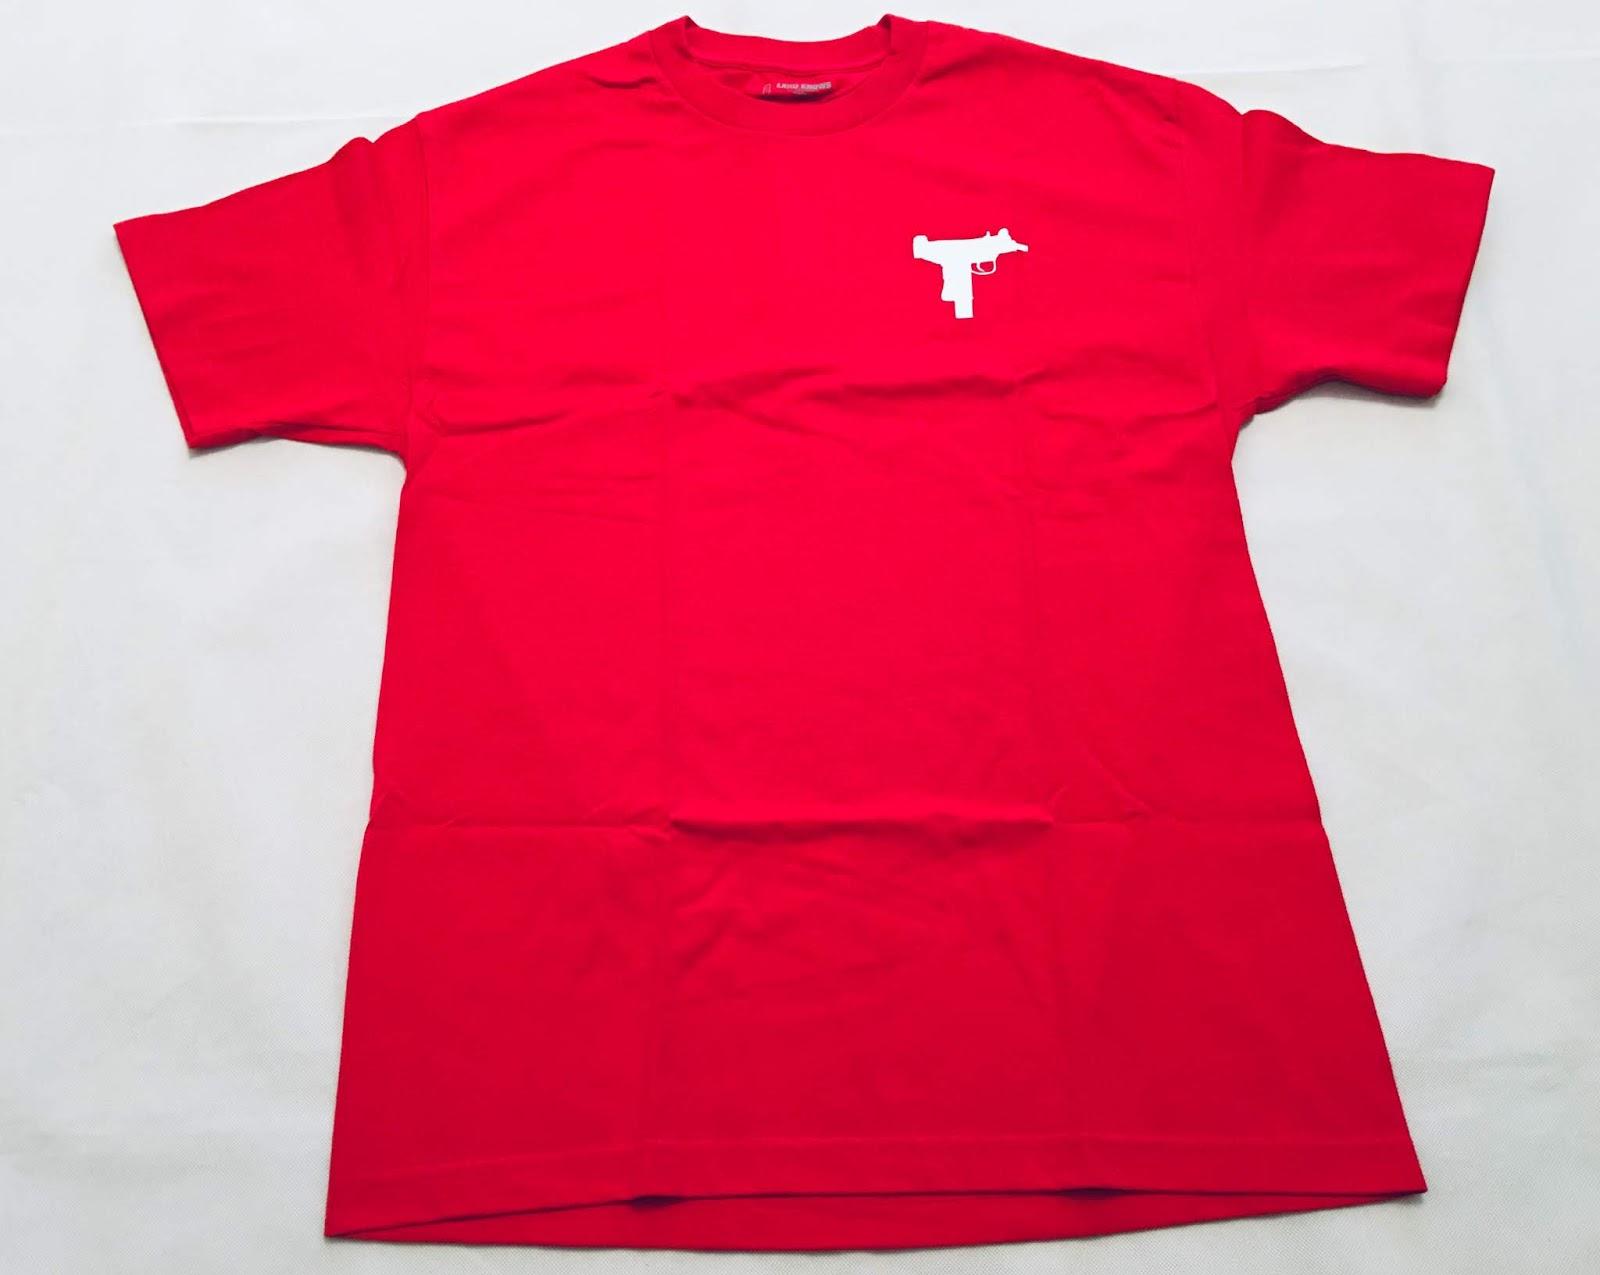 Lxrd Knows T Shirt